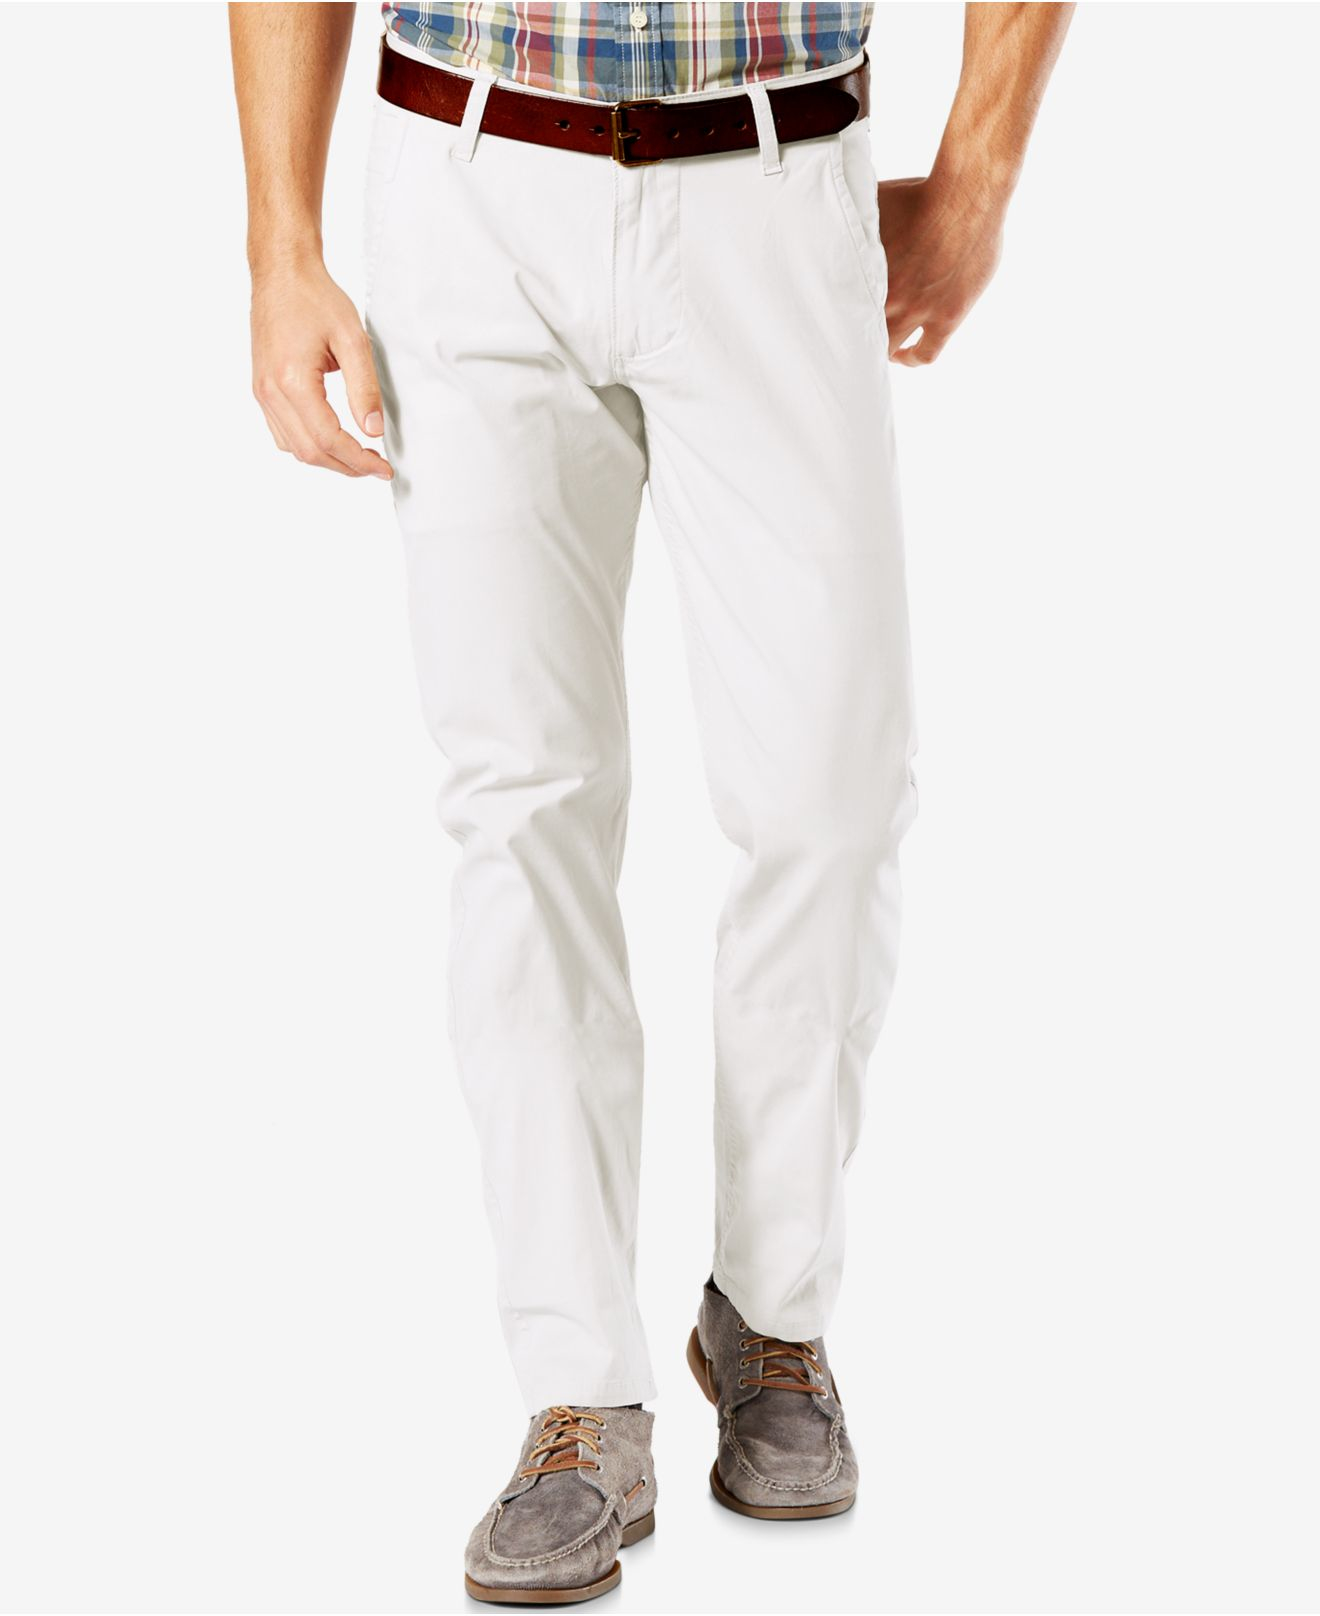 Creative  Shirt  Blouse Polka Dot Tan Pleated Bubble Shirt Khaki Pants White